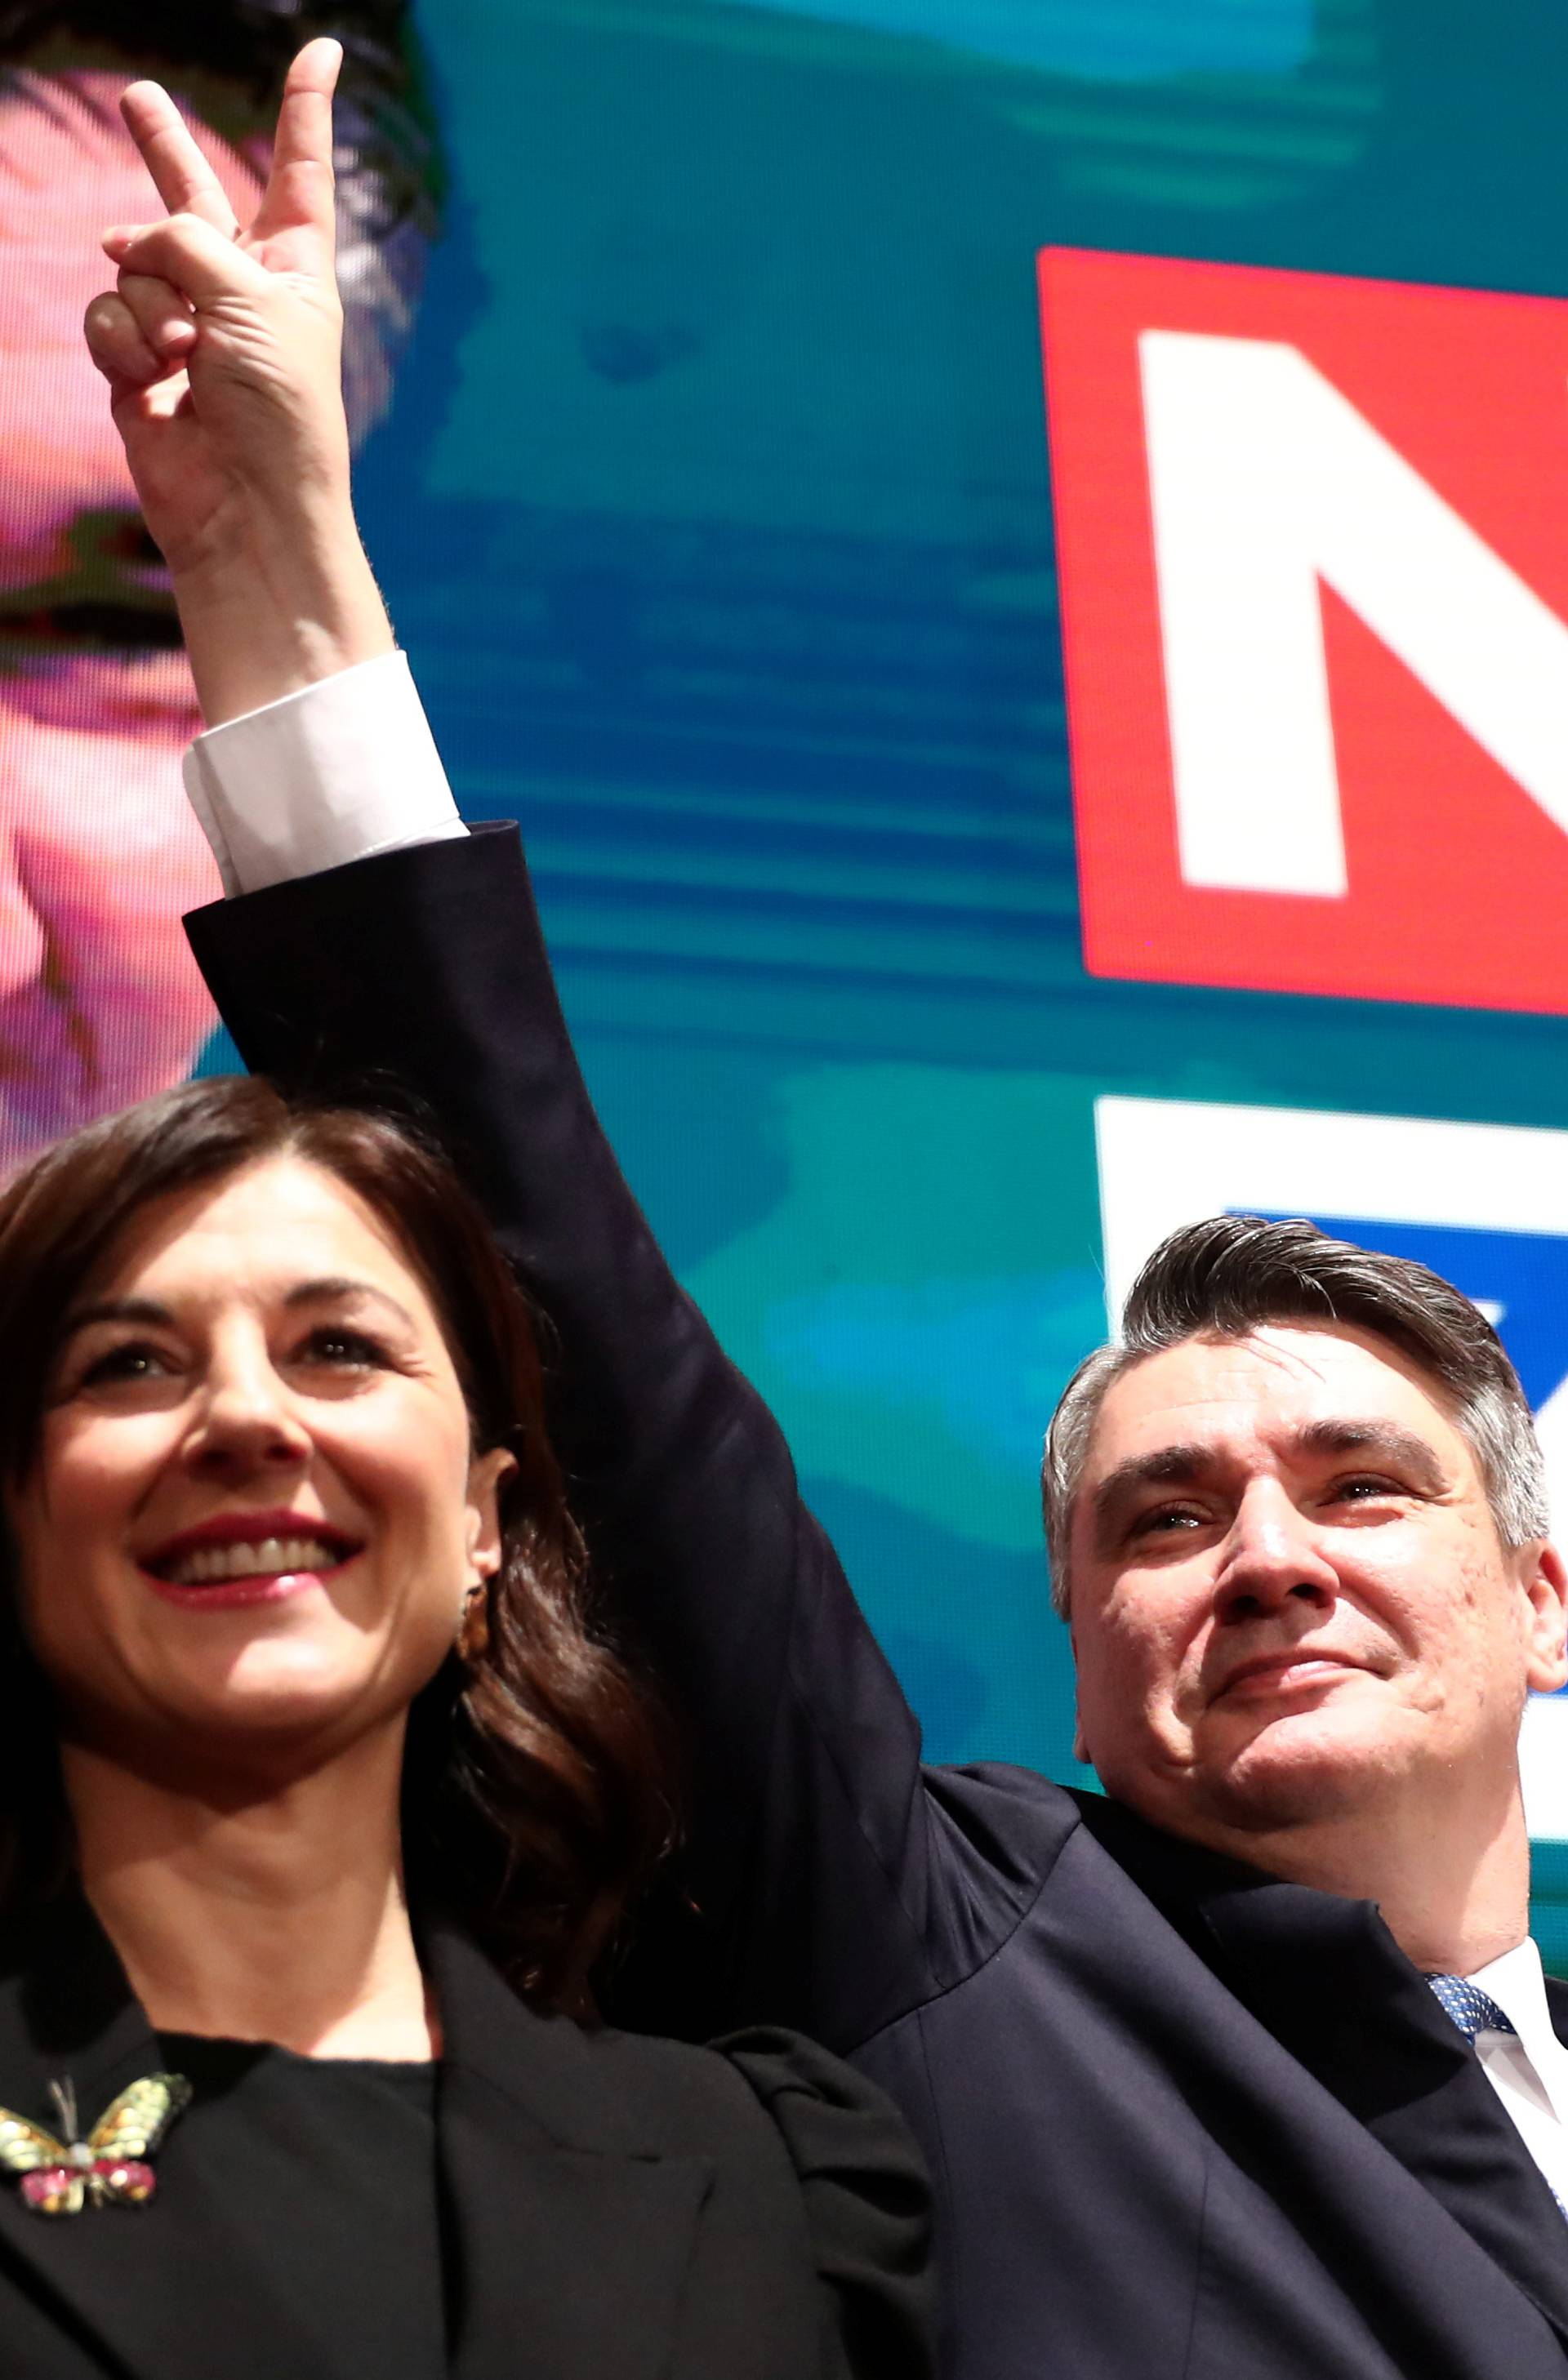 Presidential election in Croatia